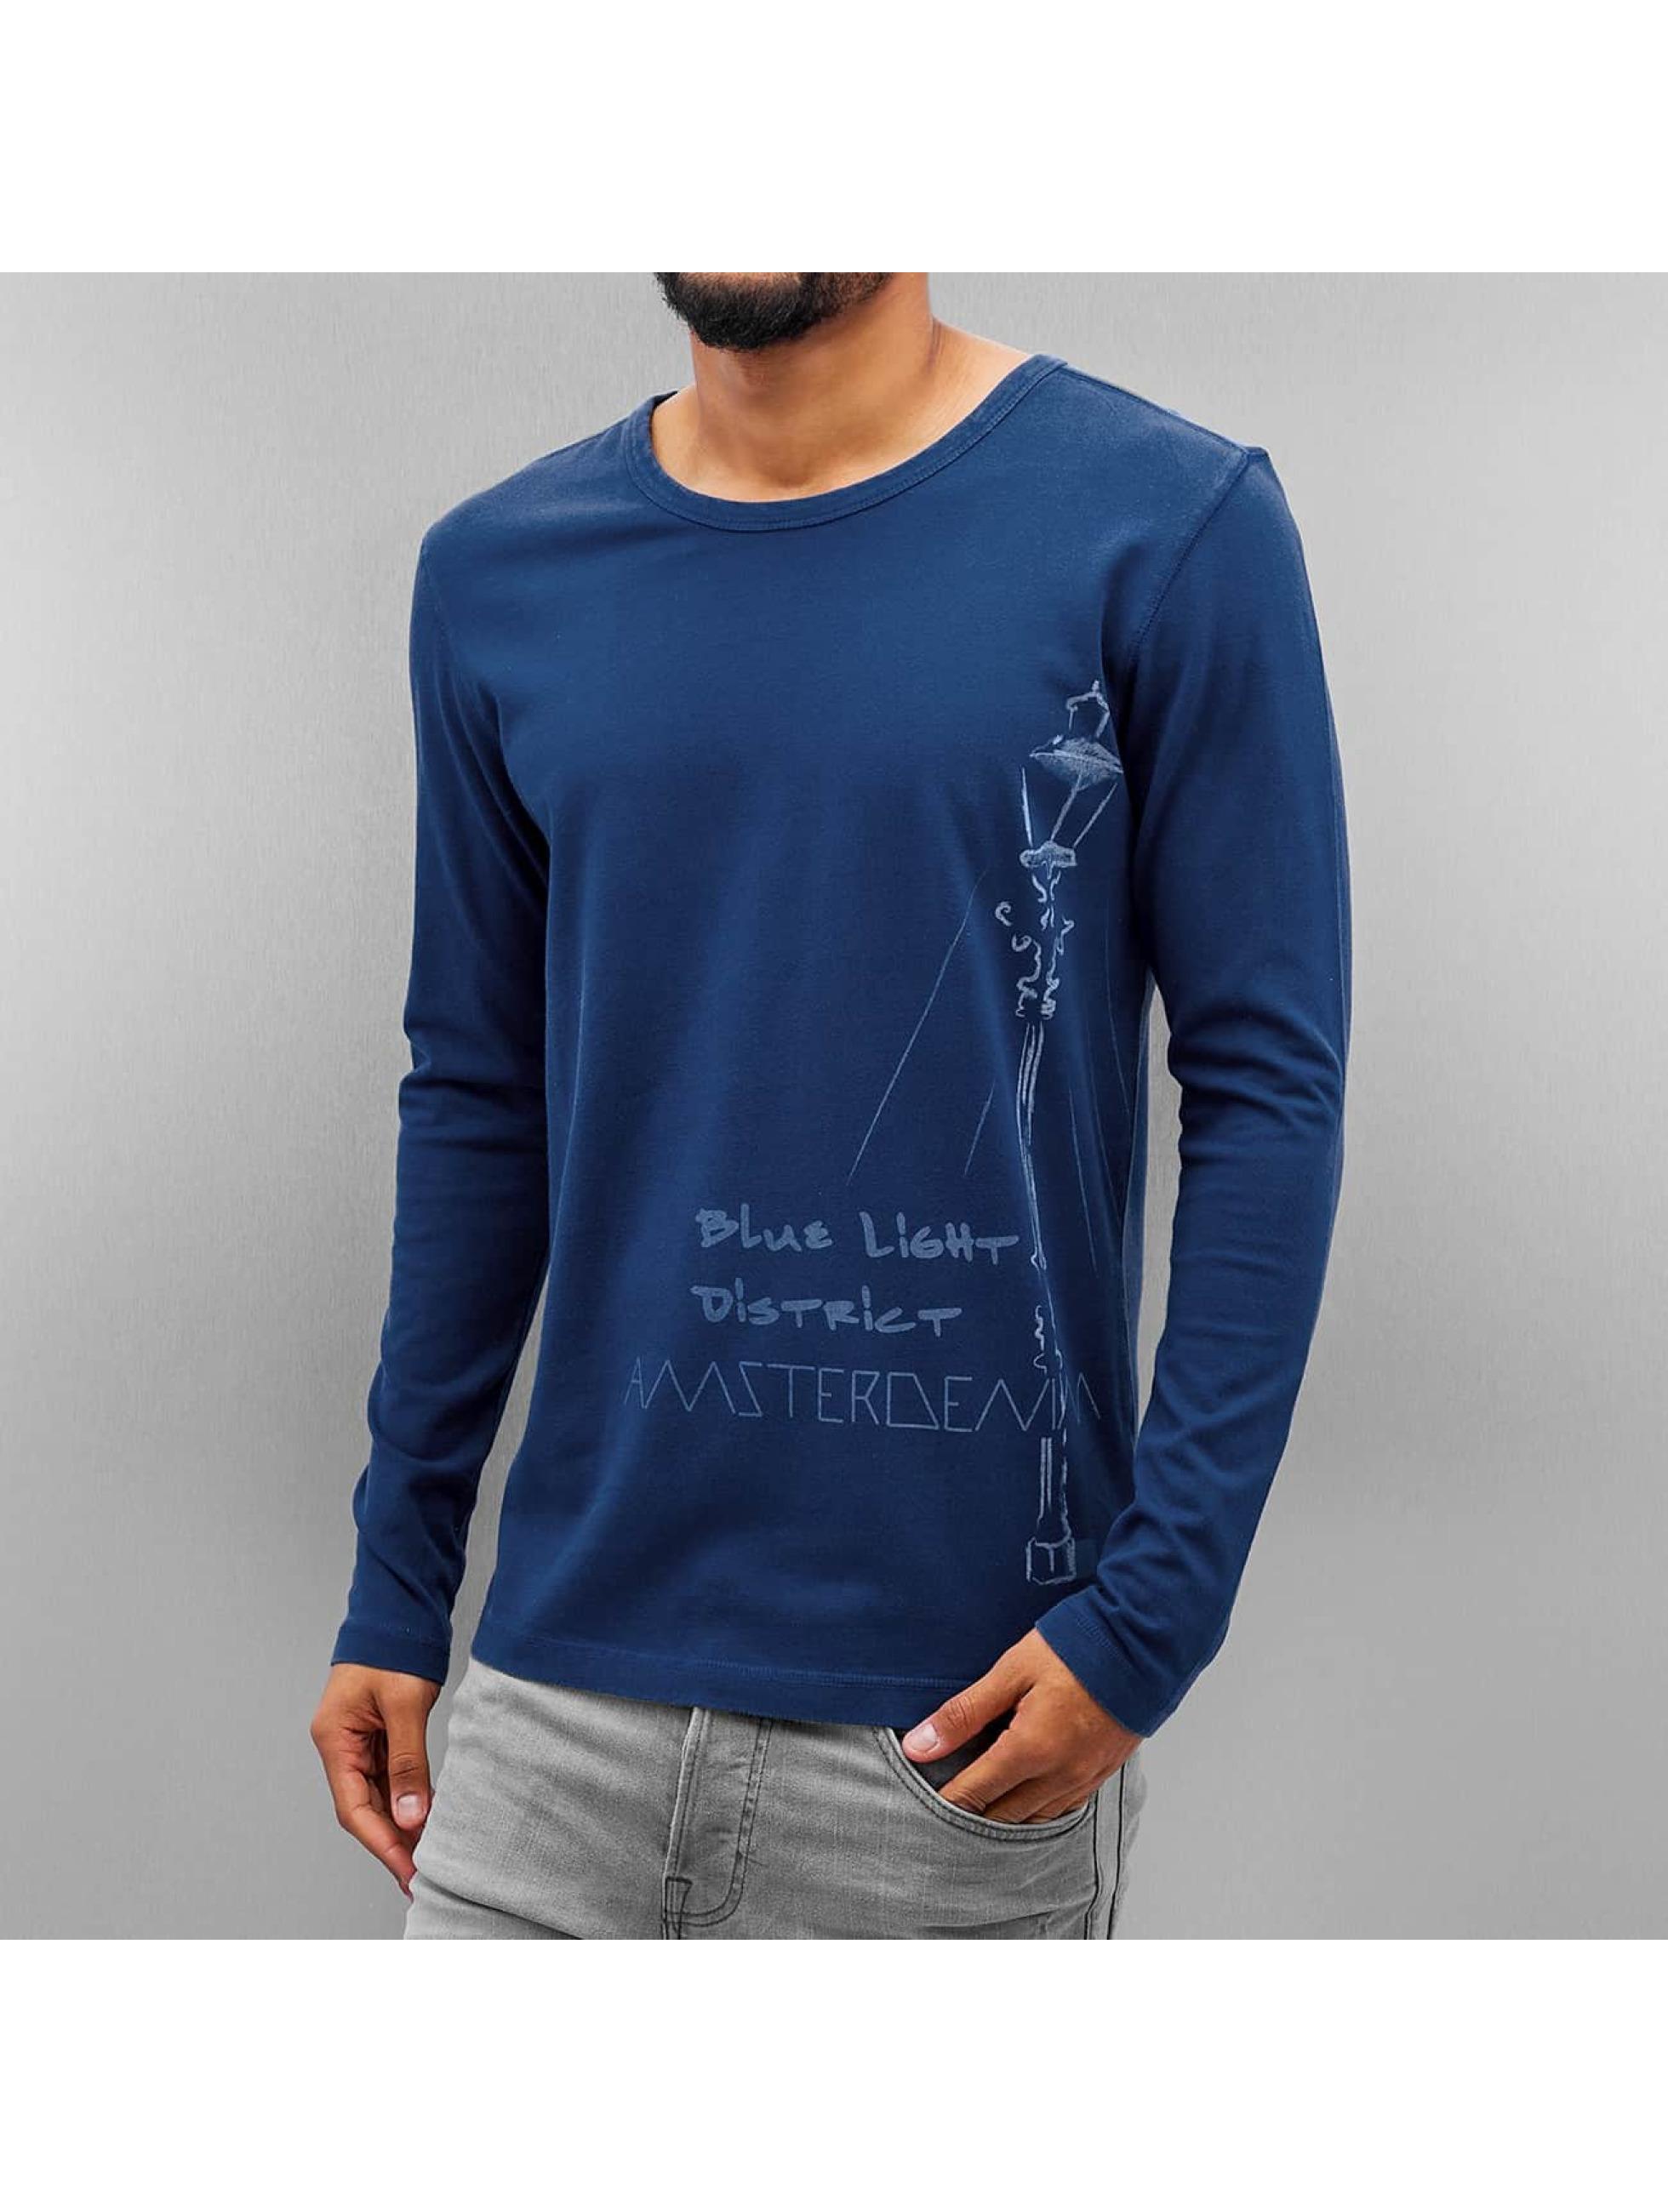 Amsterdenim Longsleeve Nelis blue